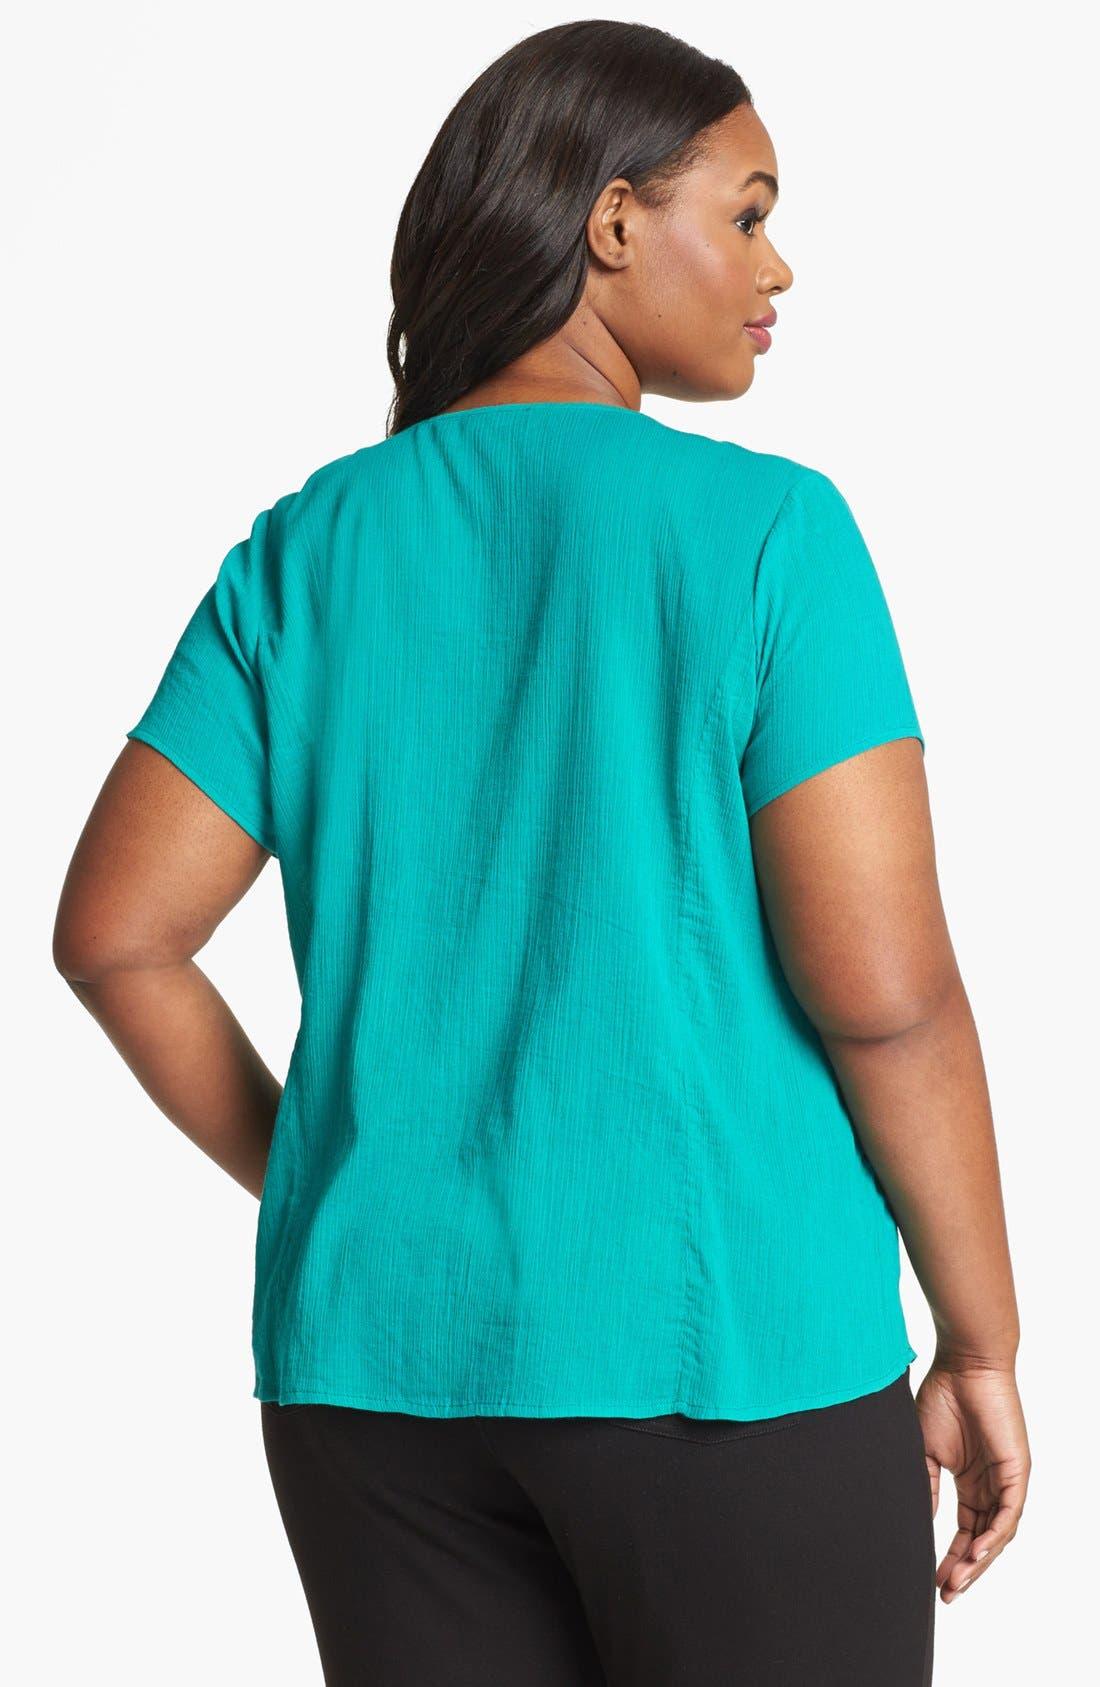 Alternate Image 2  - Lucky Brand 'Juniper' Contrast Thread Cotton Top (Plus Size)